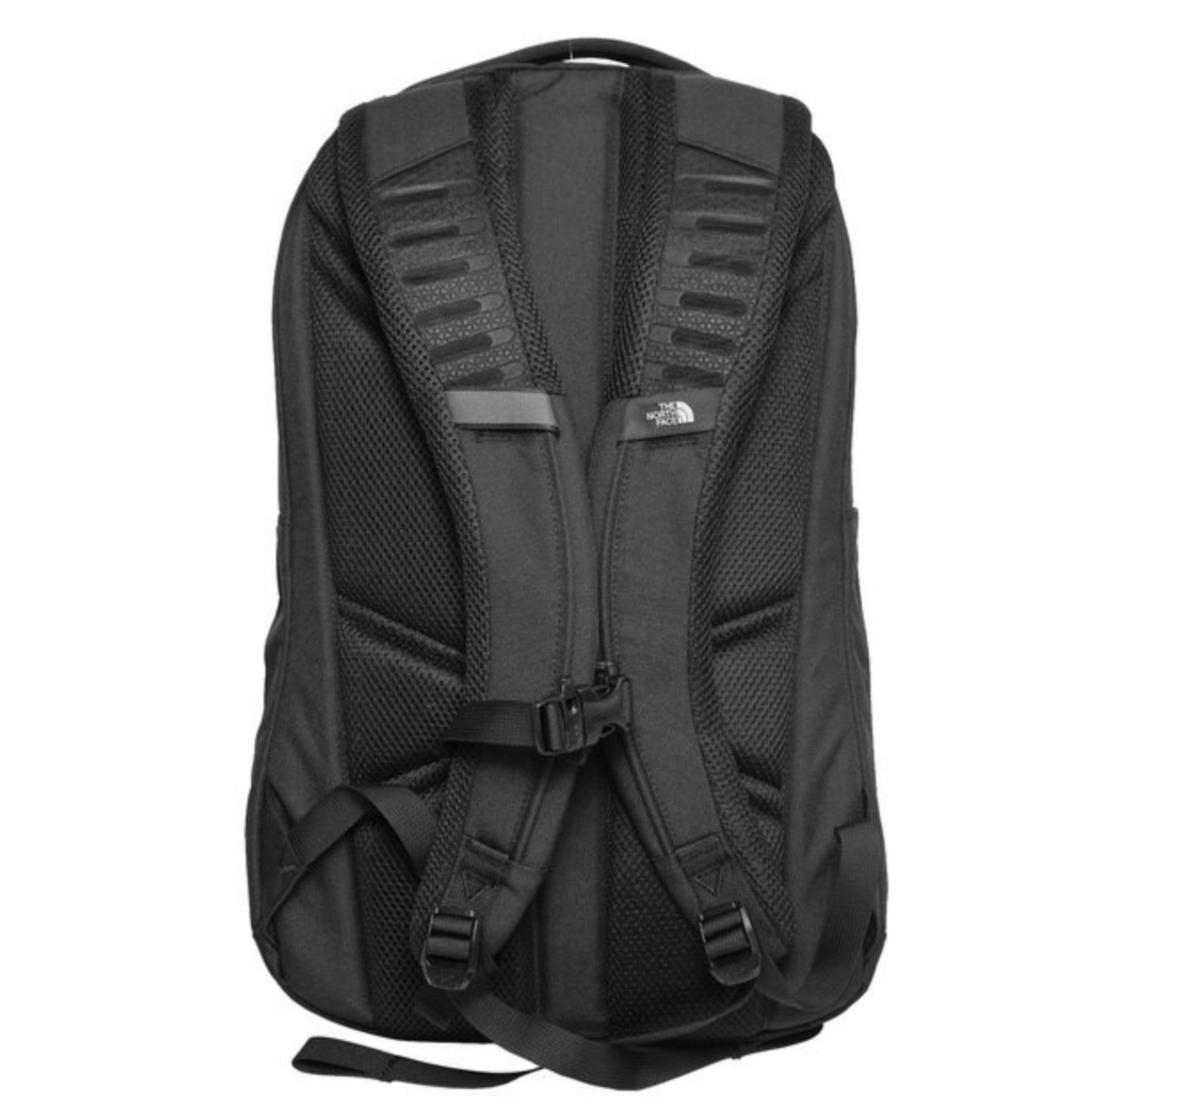 f:id:thebackpack:20191014111541p:plain